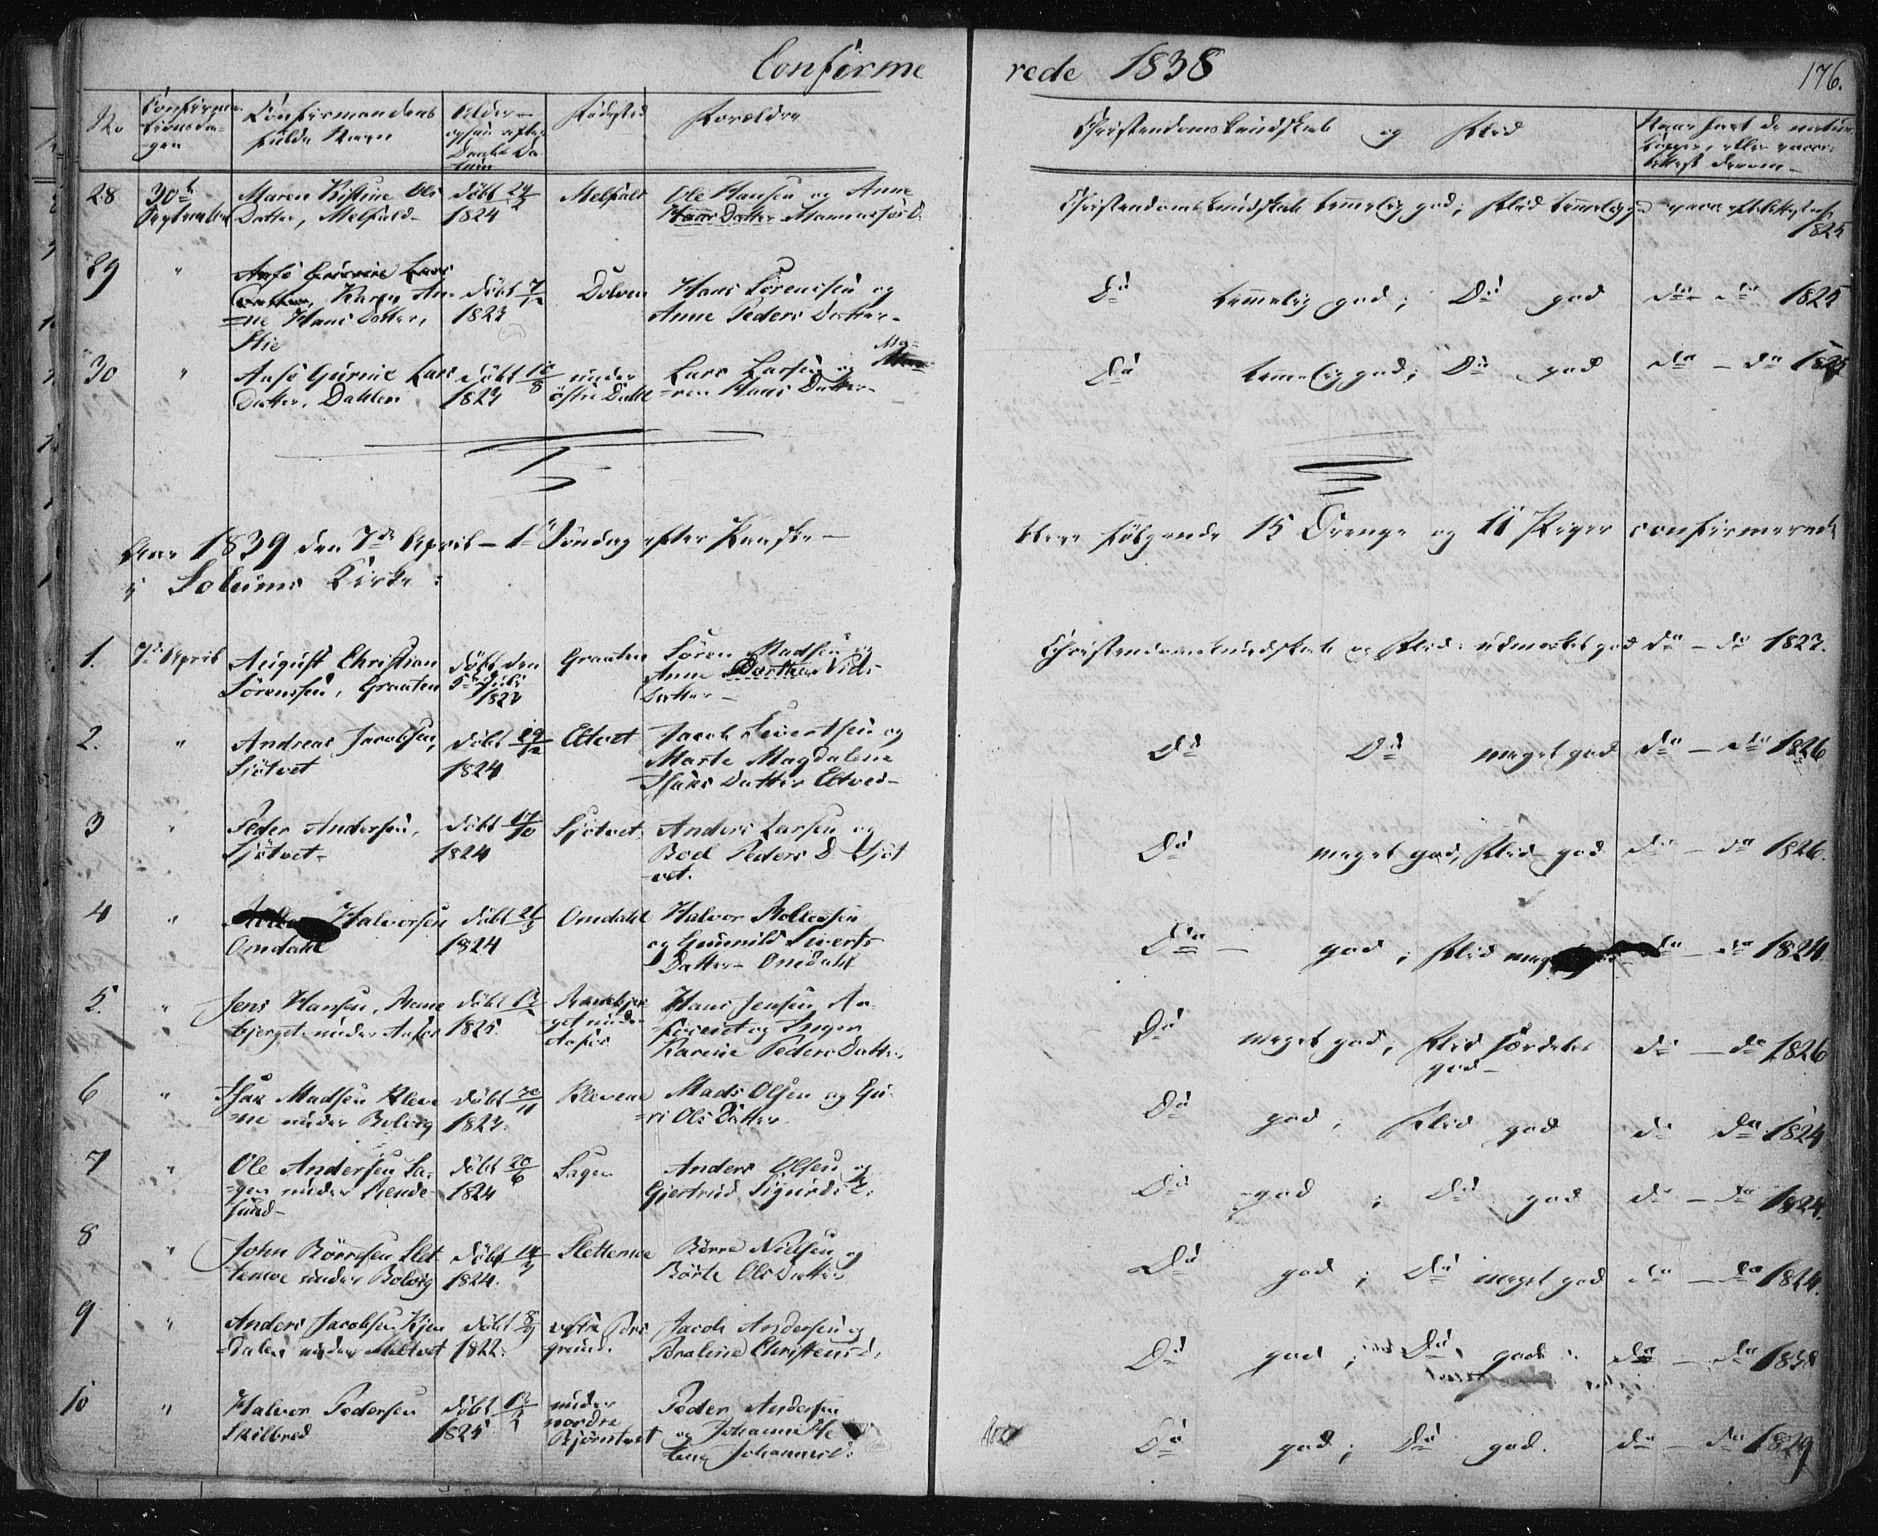 SAKO, Solum kirkebøker, F/Fa/L0005: Ministerialbok nr. I 5, 1833-1843, s. 176